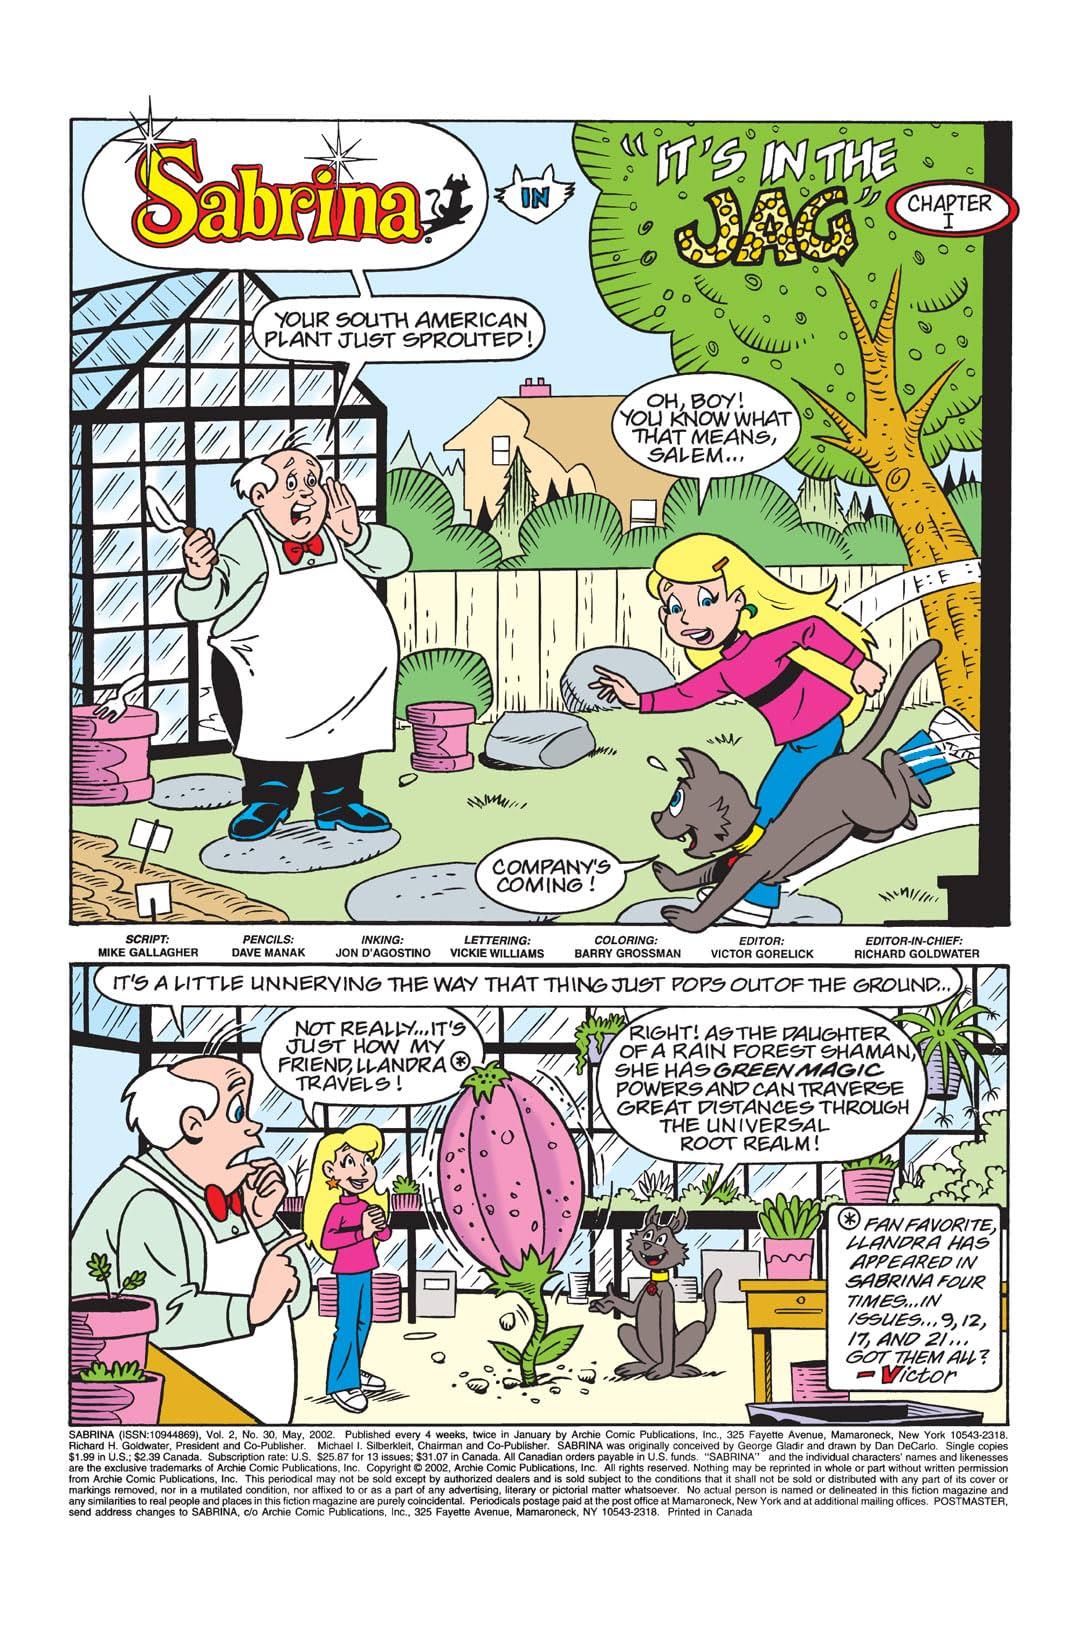 Sabrina the Teenage Witch Animated Series #30